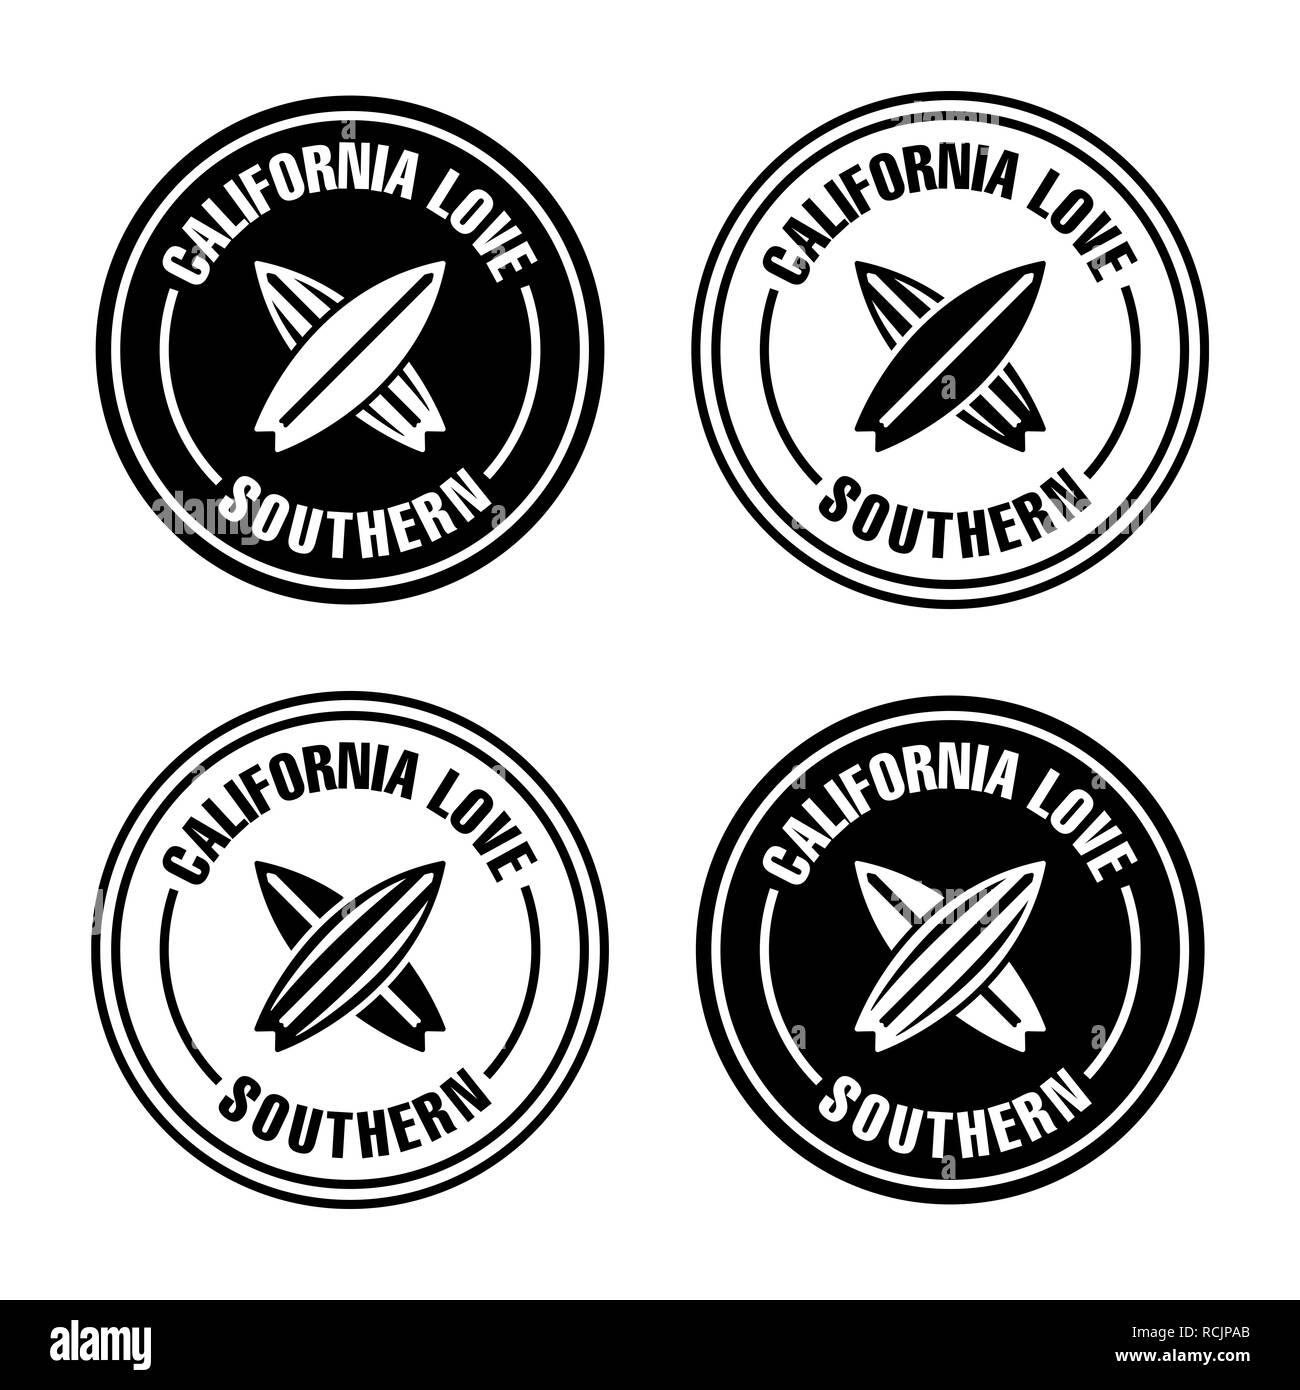 Surfing board logo badges. - Stock Image